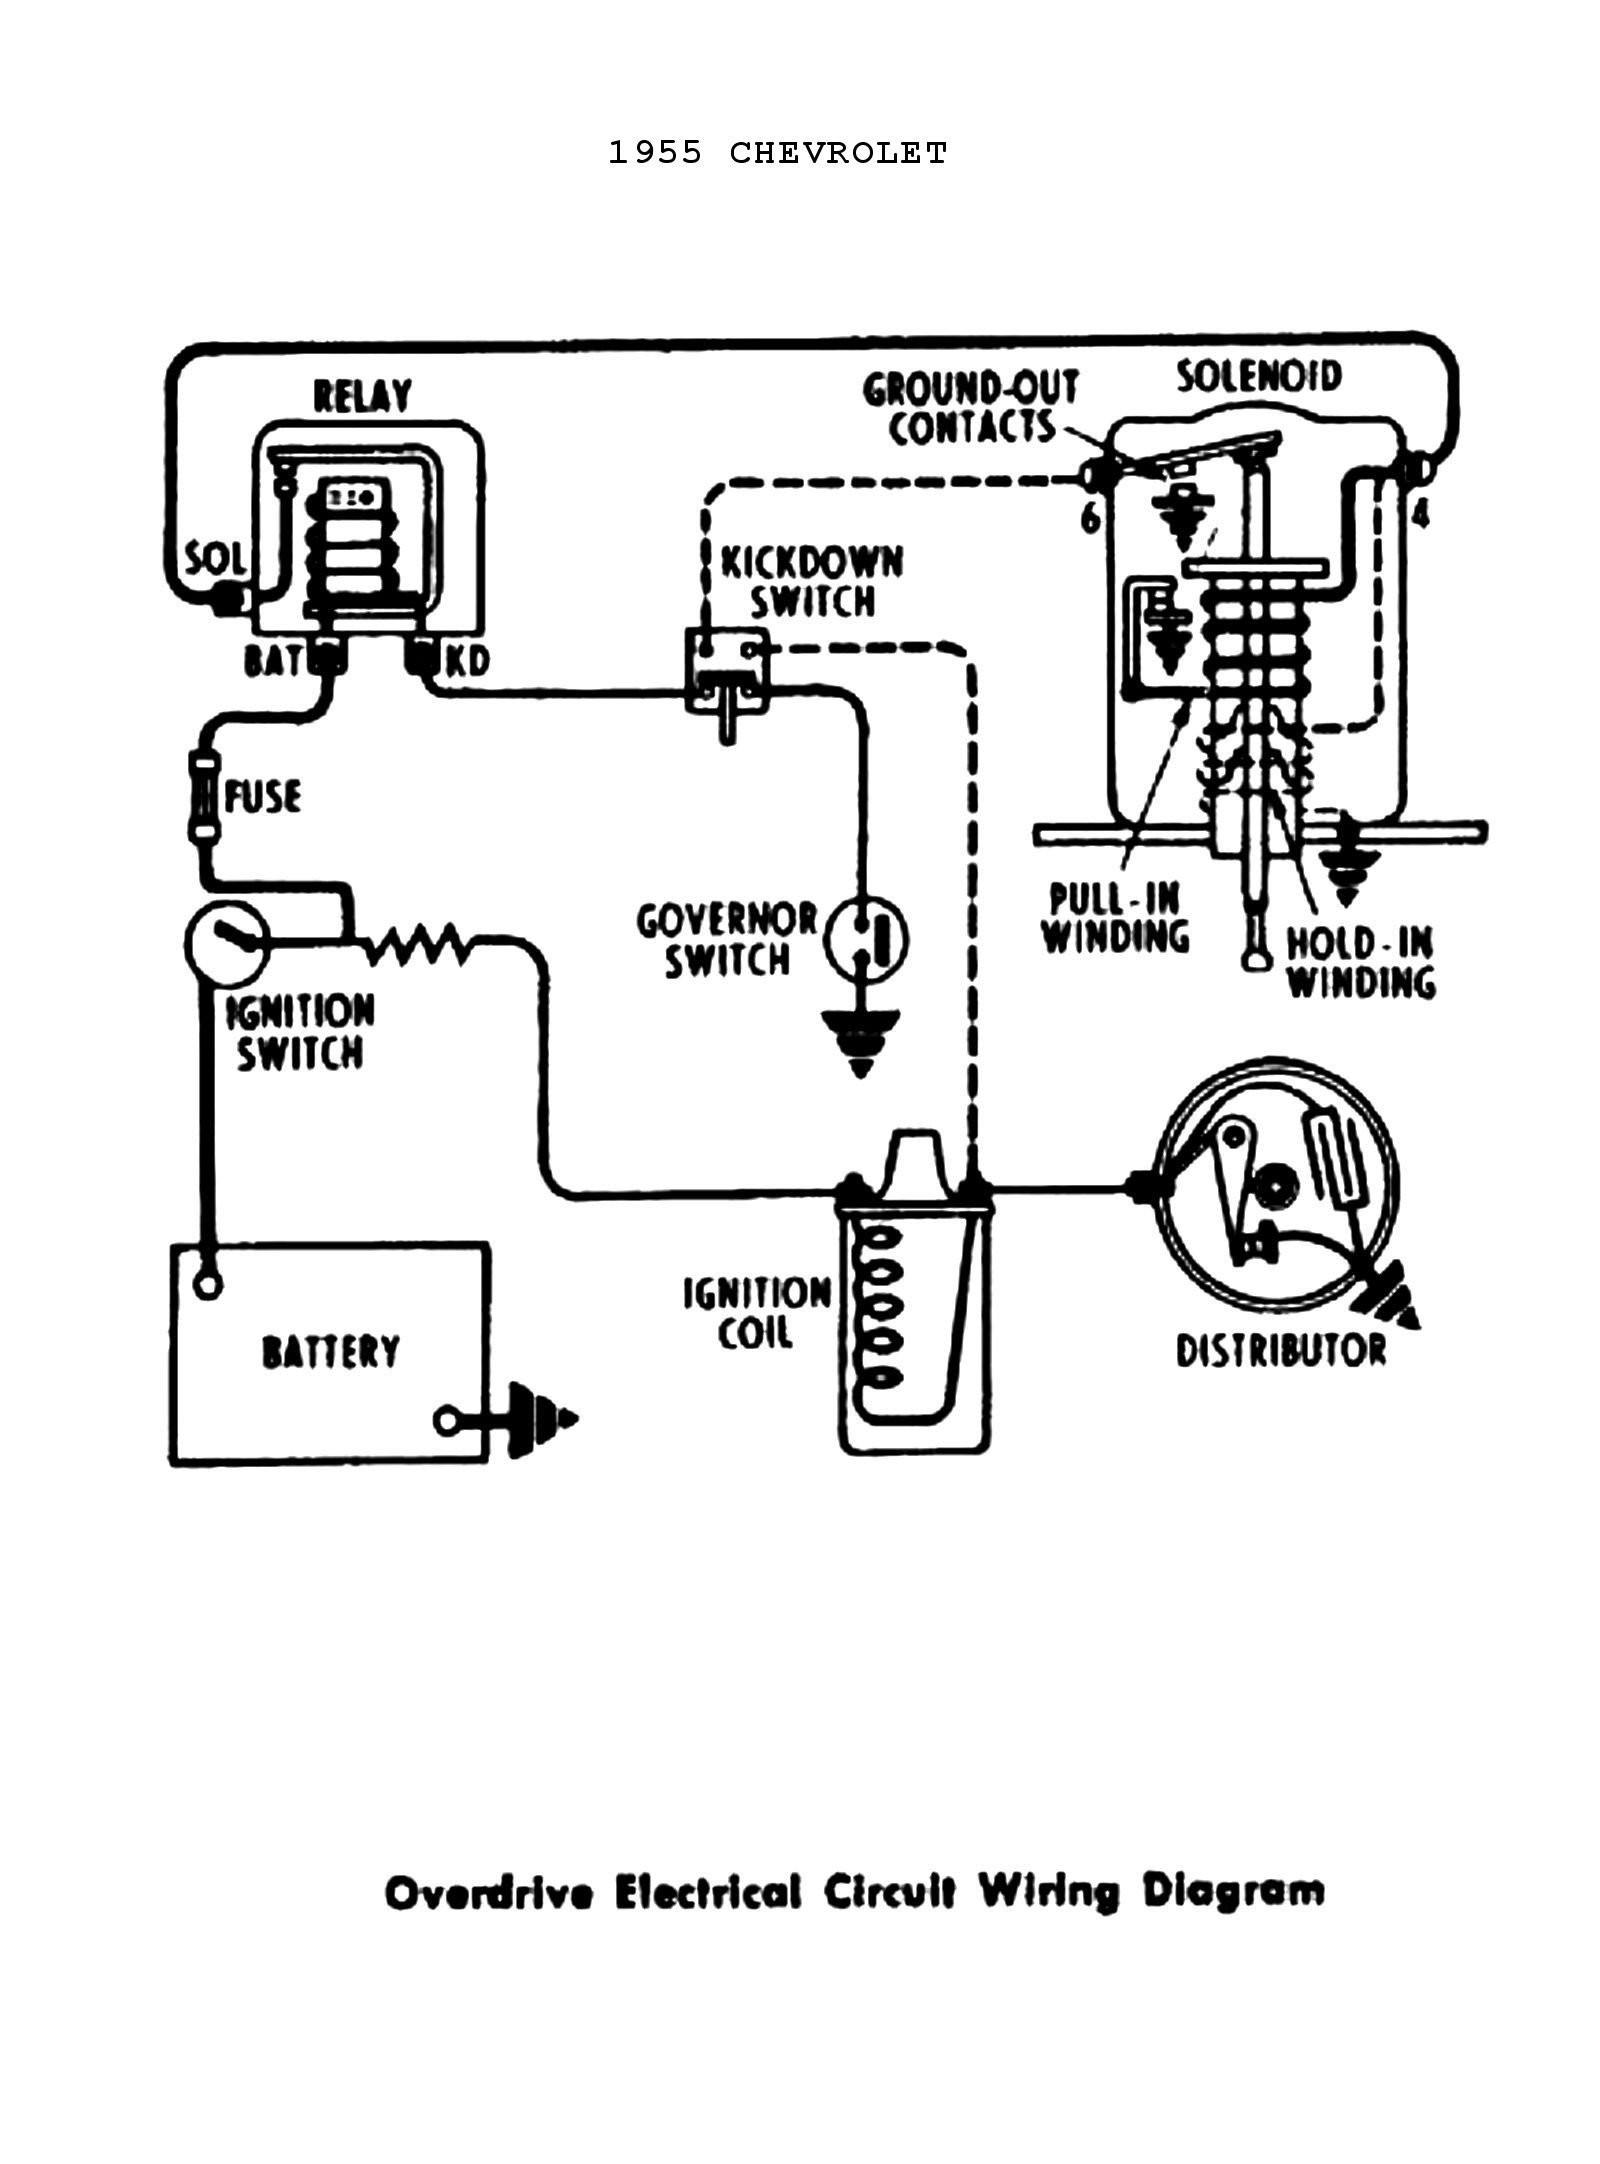 indak rotary switch wiring diagram trusted wiring diagrams u2022 rh sivamuni com